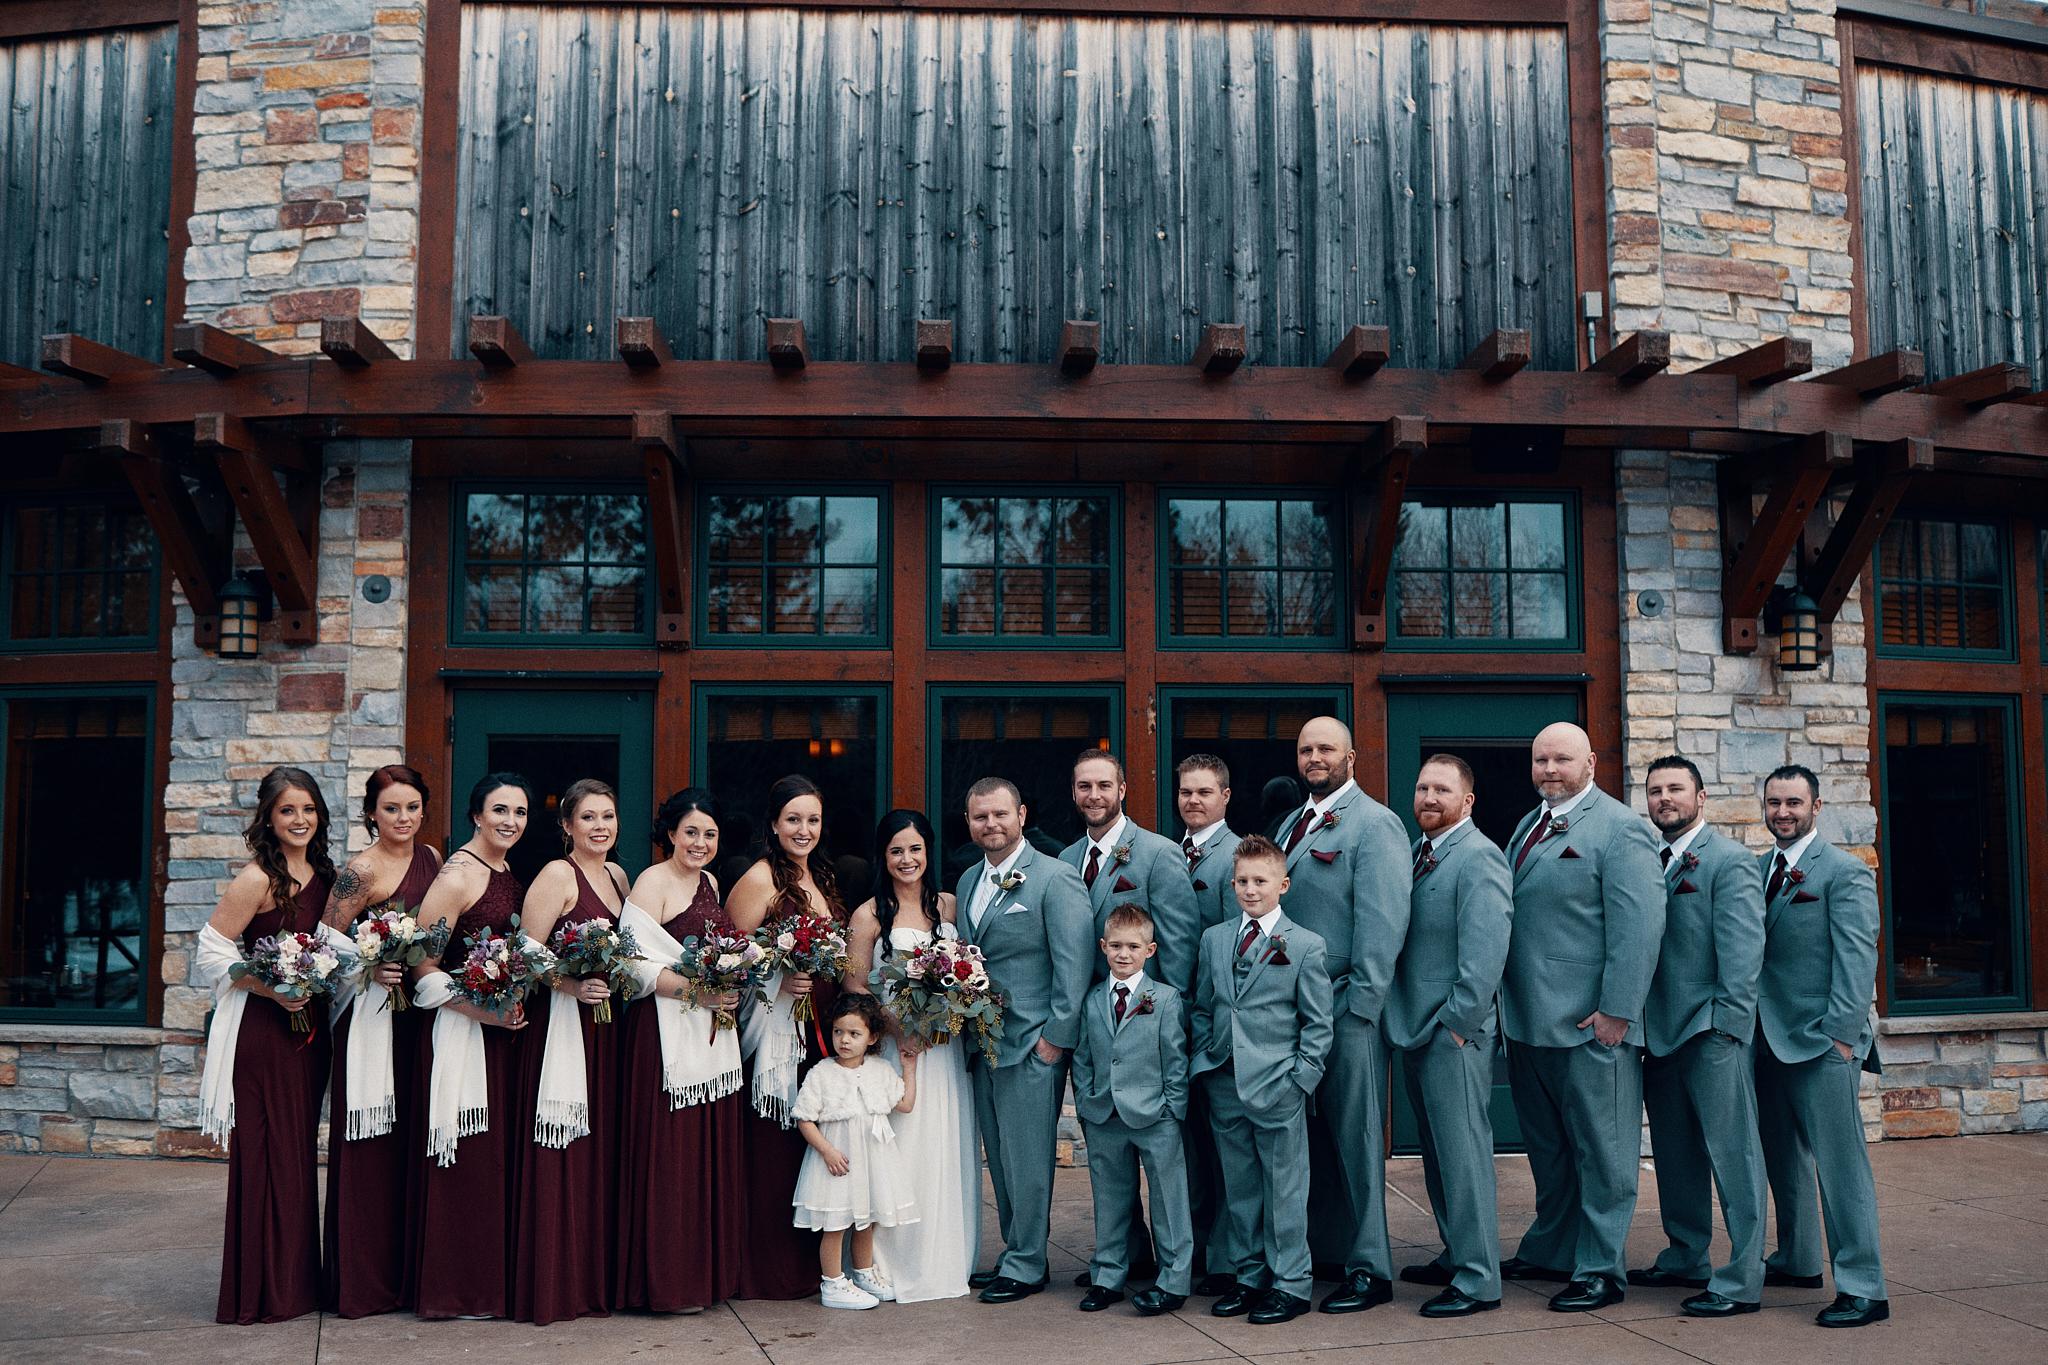 Wedding_By_High_End_Minneapolis_Brand_Photographer_Something_Candid_053.JPG